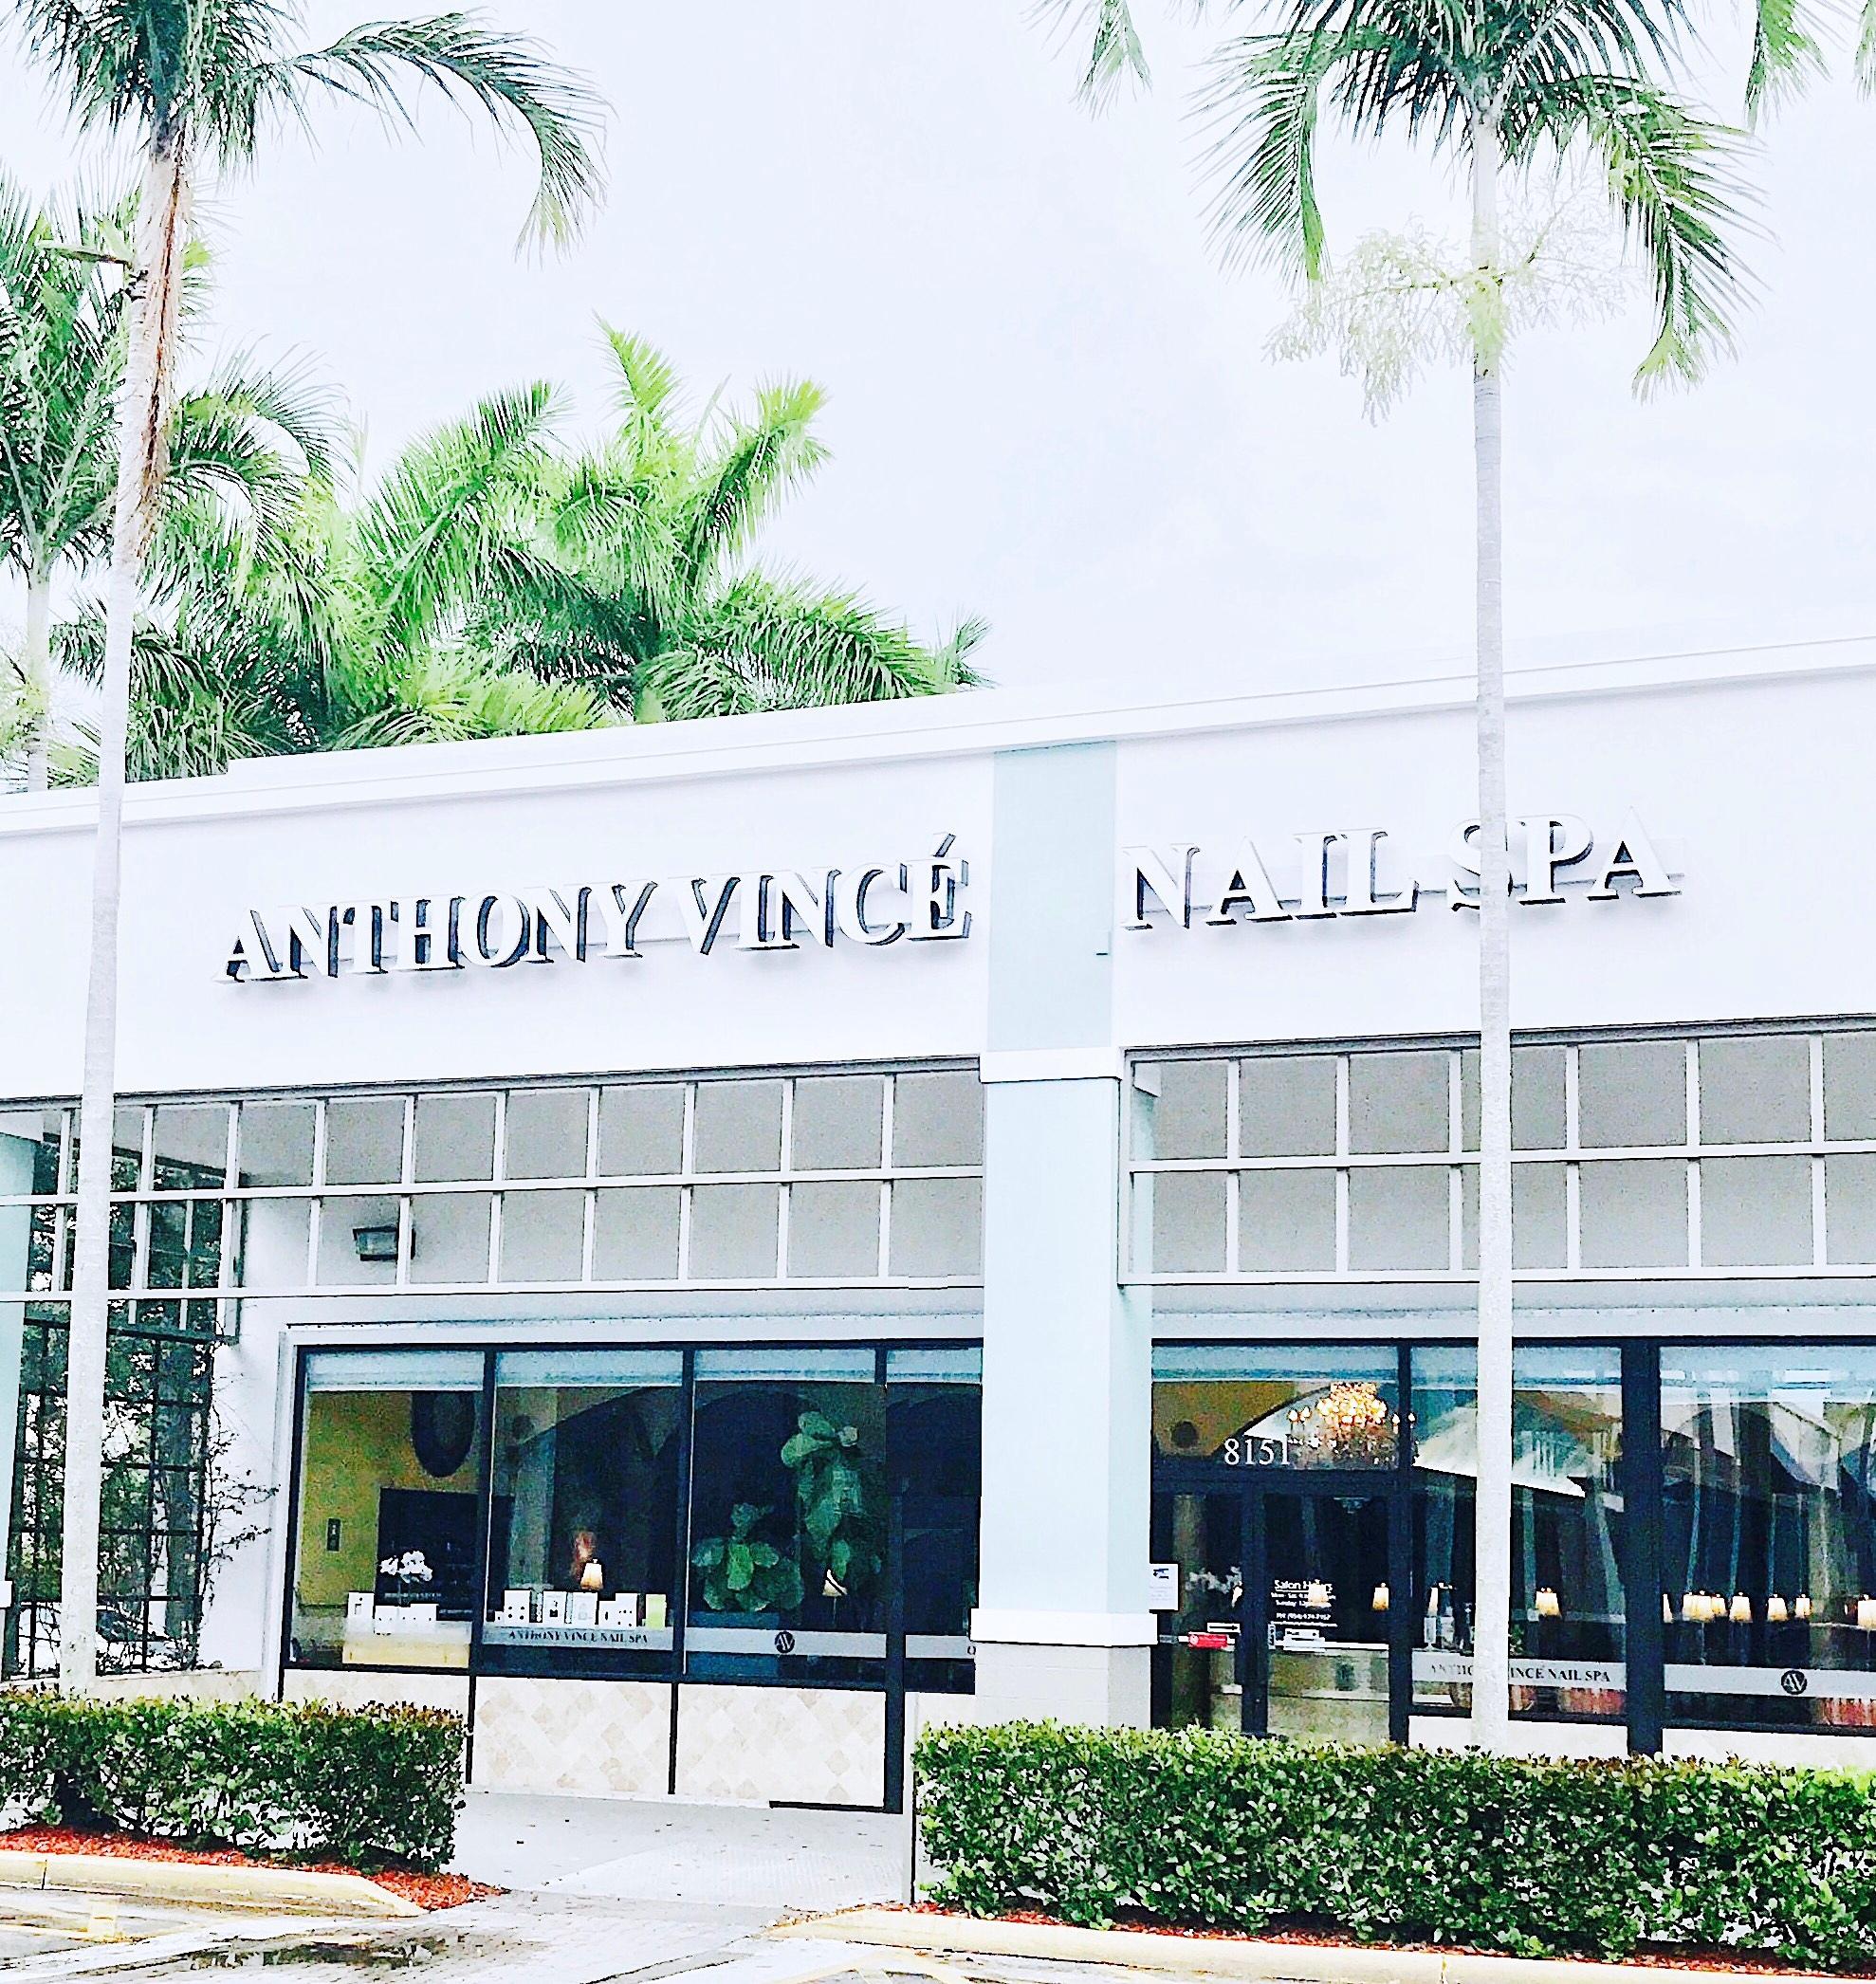 Anthony Vince' Nail Spa  (Plantation, FL location)